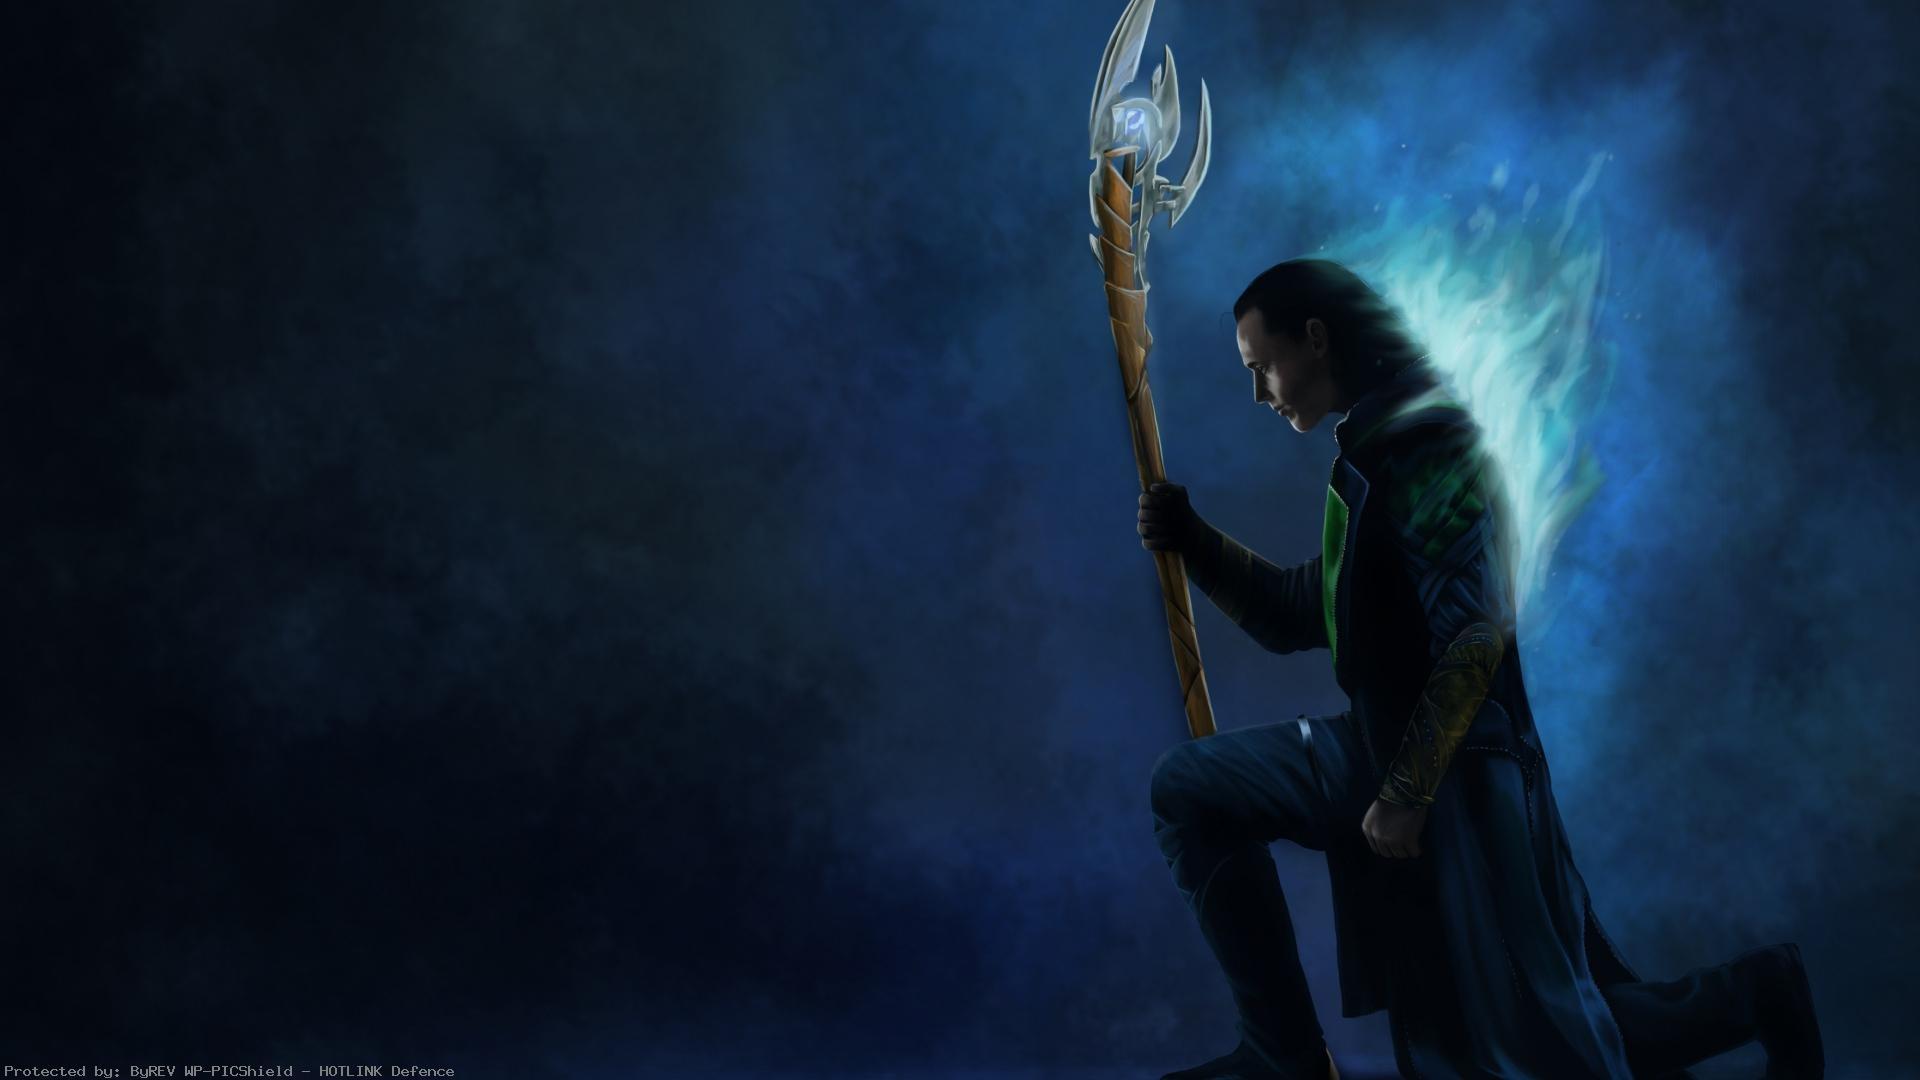 Avengers-Loki-Tom-Hiddleston-1920×1080-Need-iPhone-S-